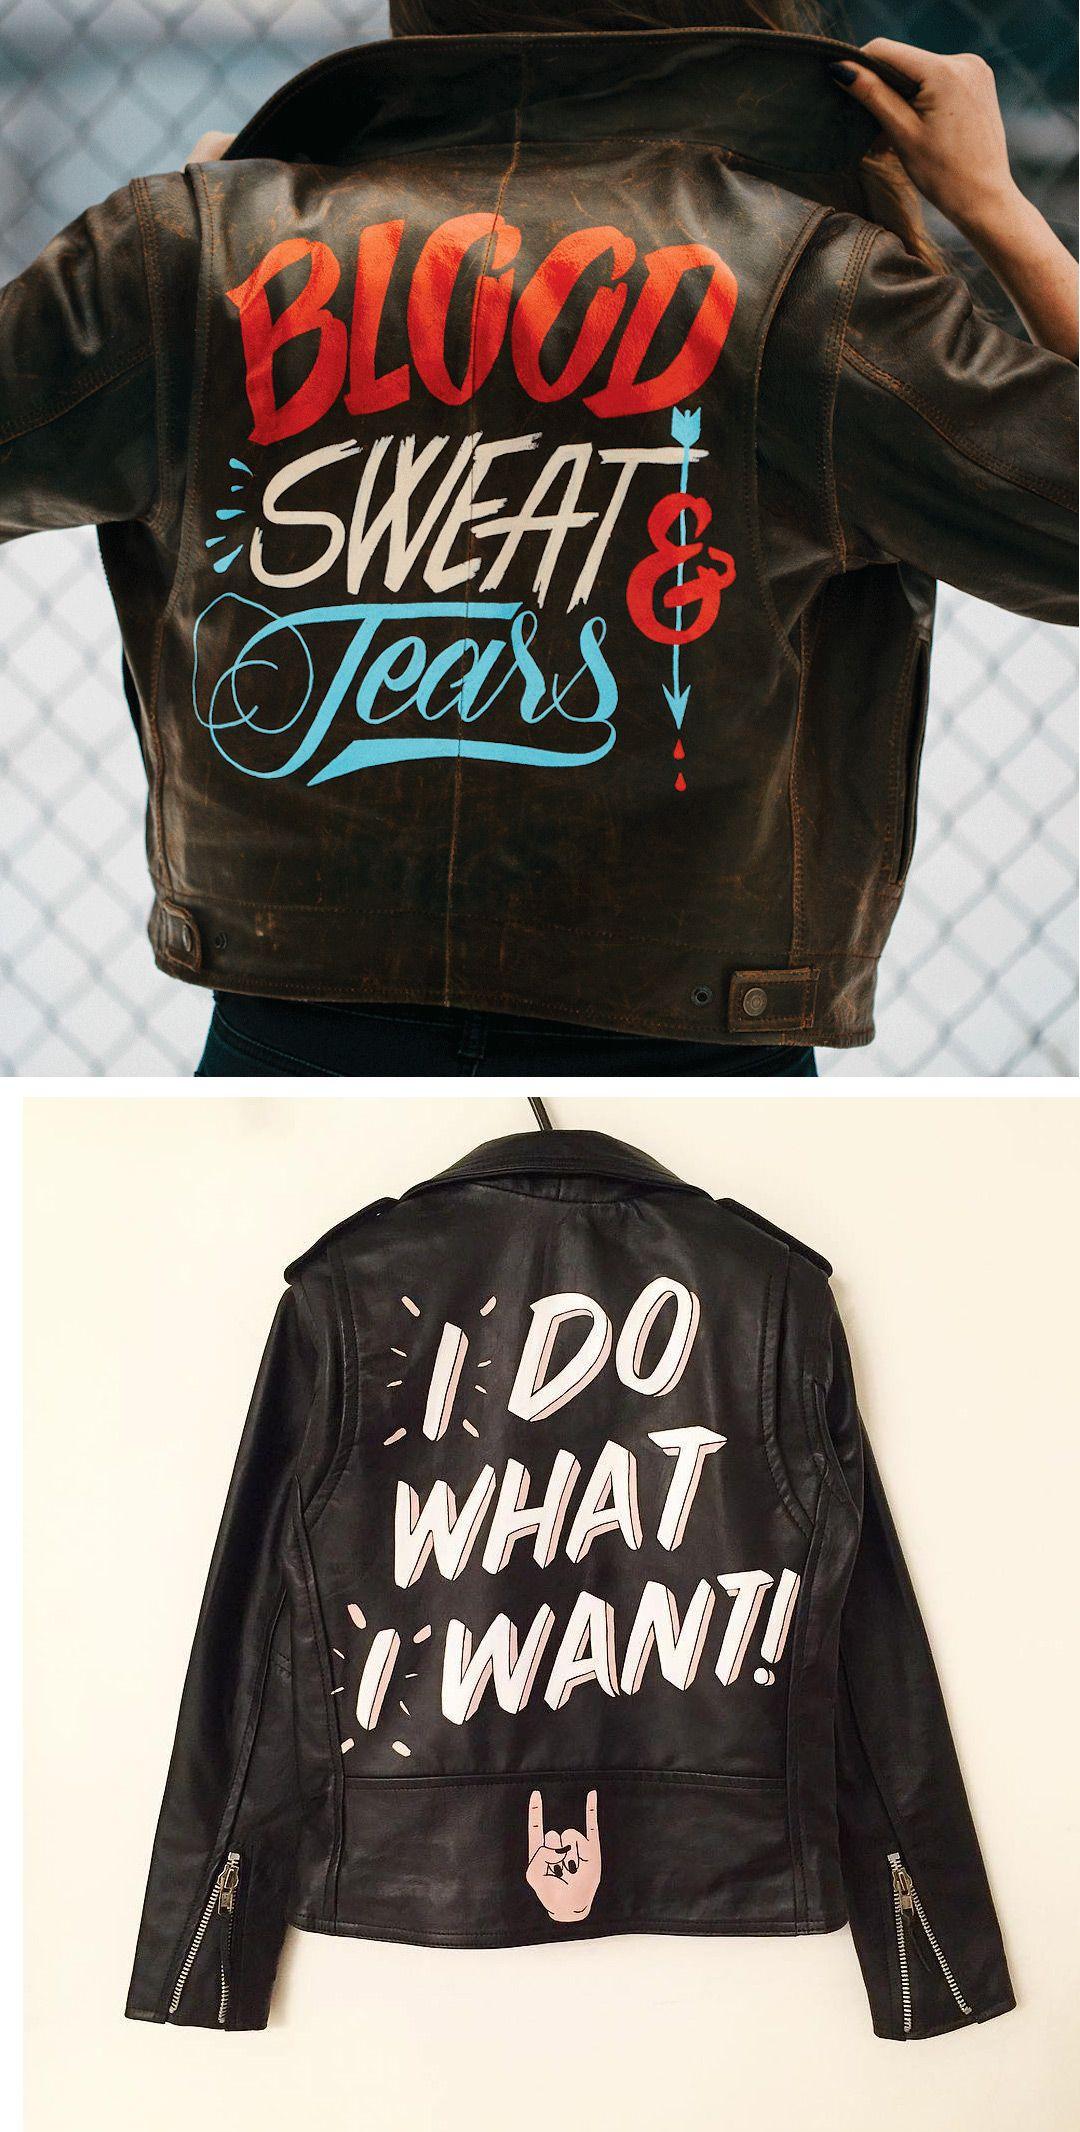 004b53f6 Painted leather jackets | hand painted jacket | illustration on jacket |  hand lettered fashion